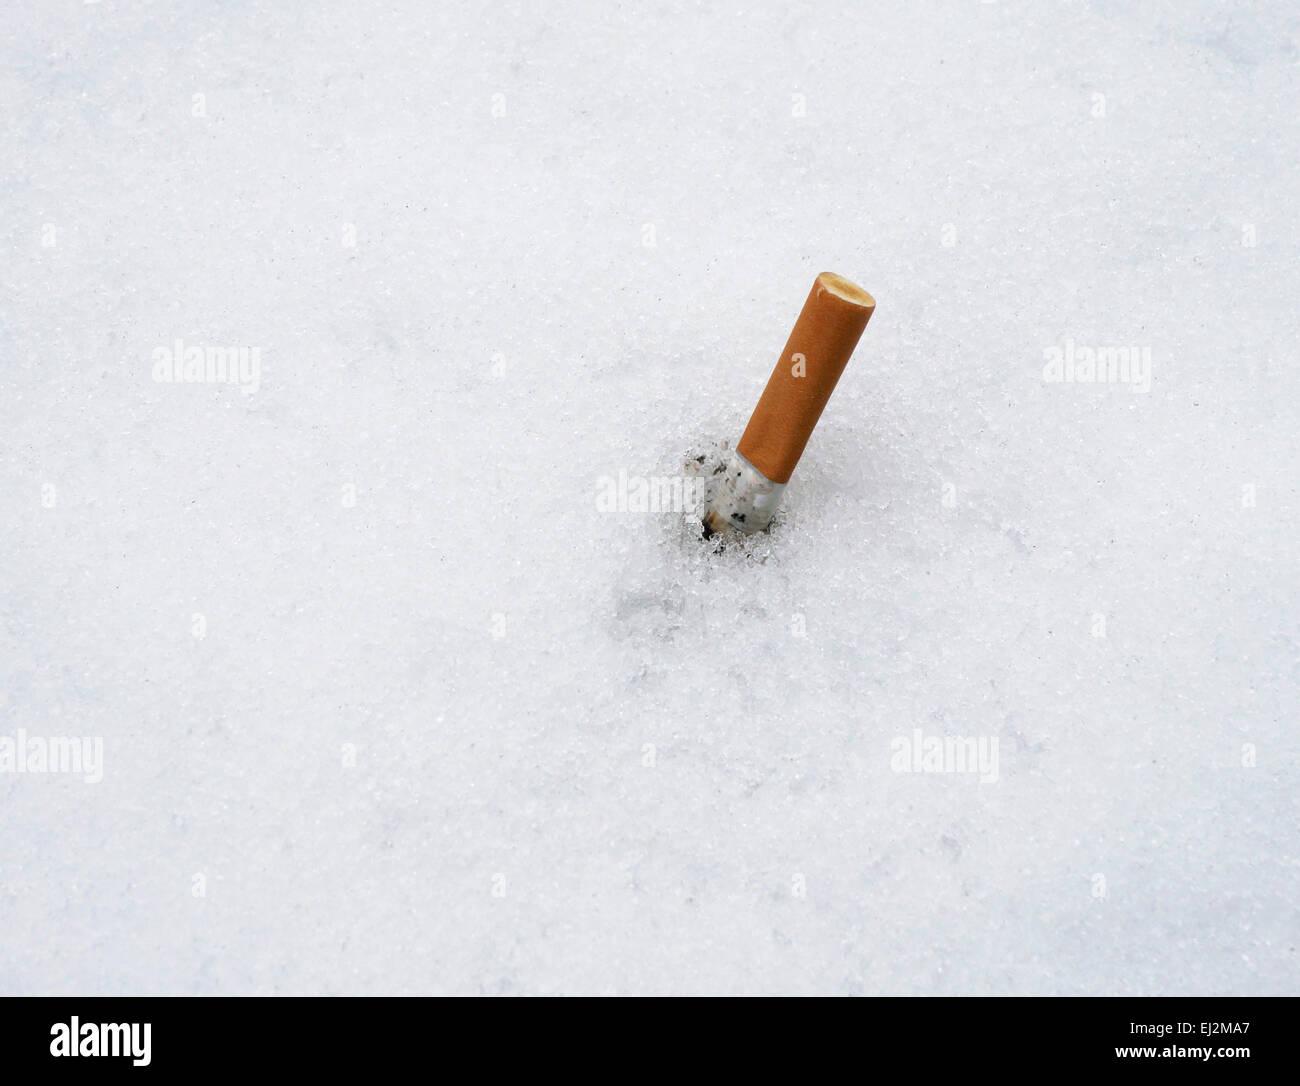 cigarette stub in snow - Stock Image